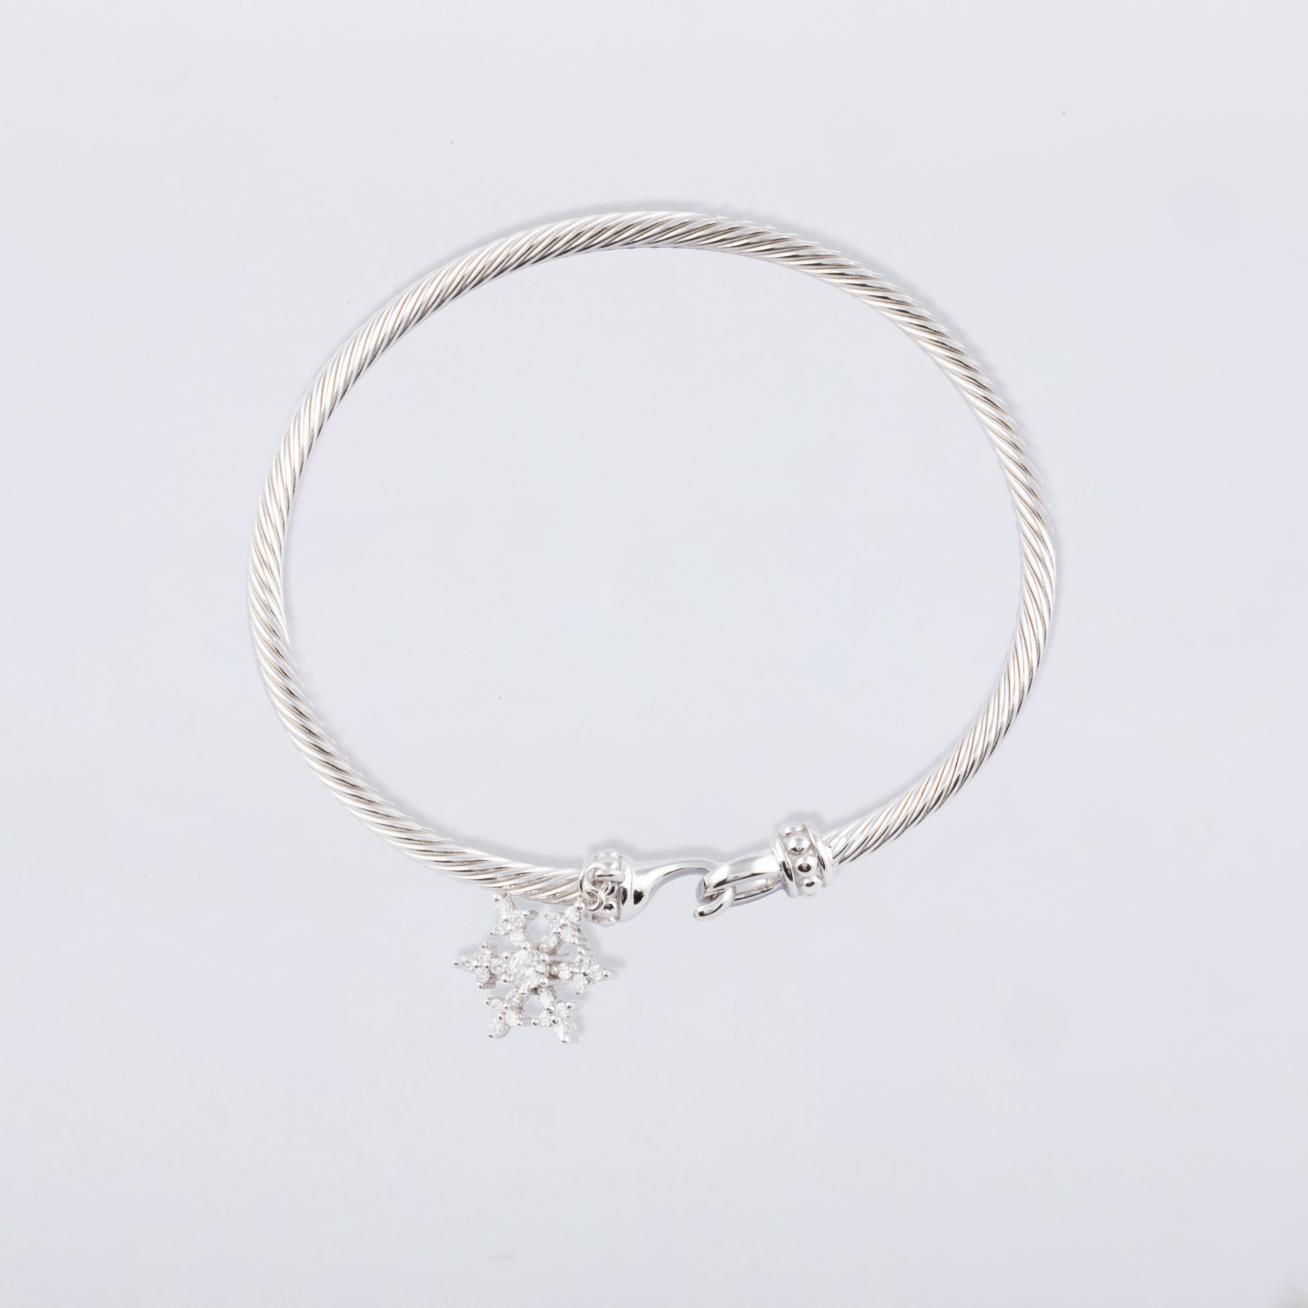 Bangle with snowflake pendant in white zircons